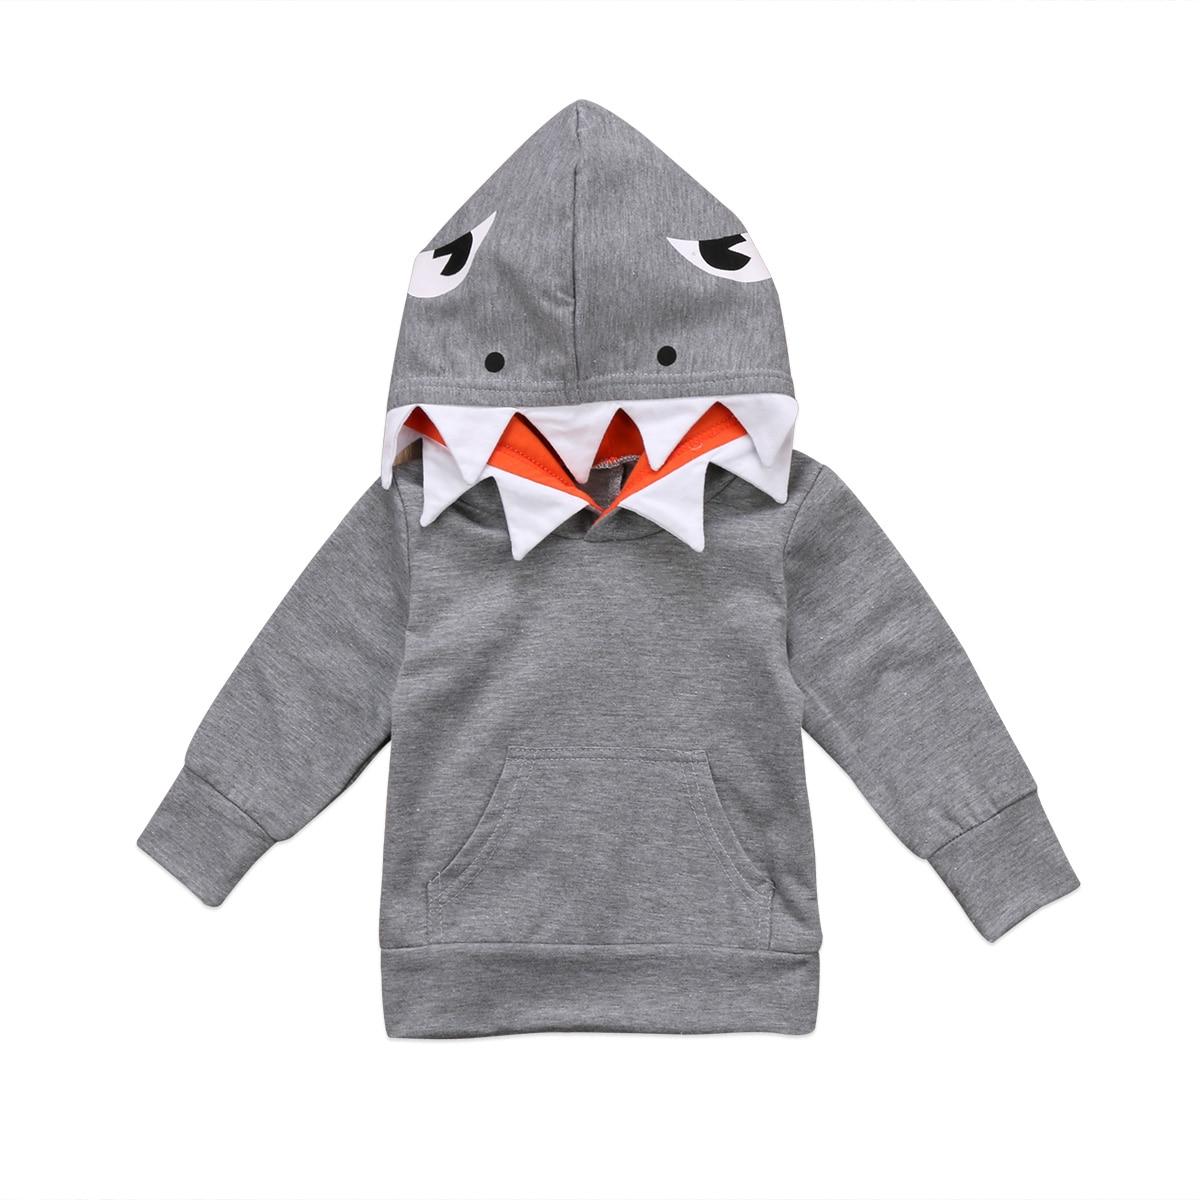 Cute Toddler Kids Boys Shark Face Hooded Tops T shirt Coat Outerwear 2017 New Casual Large Pocket Tee Shirt asymmetric gingham pocket shirt